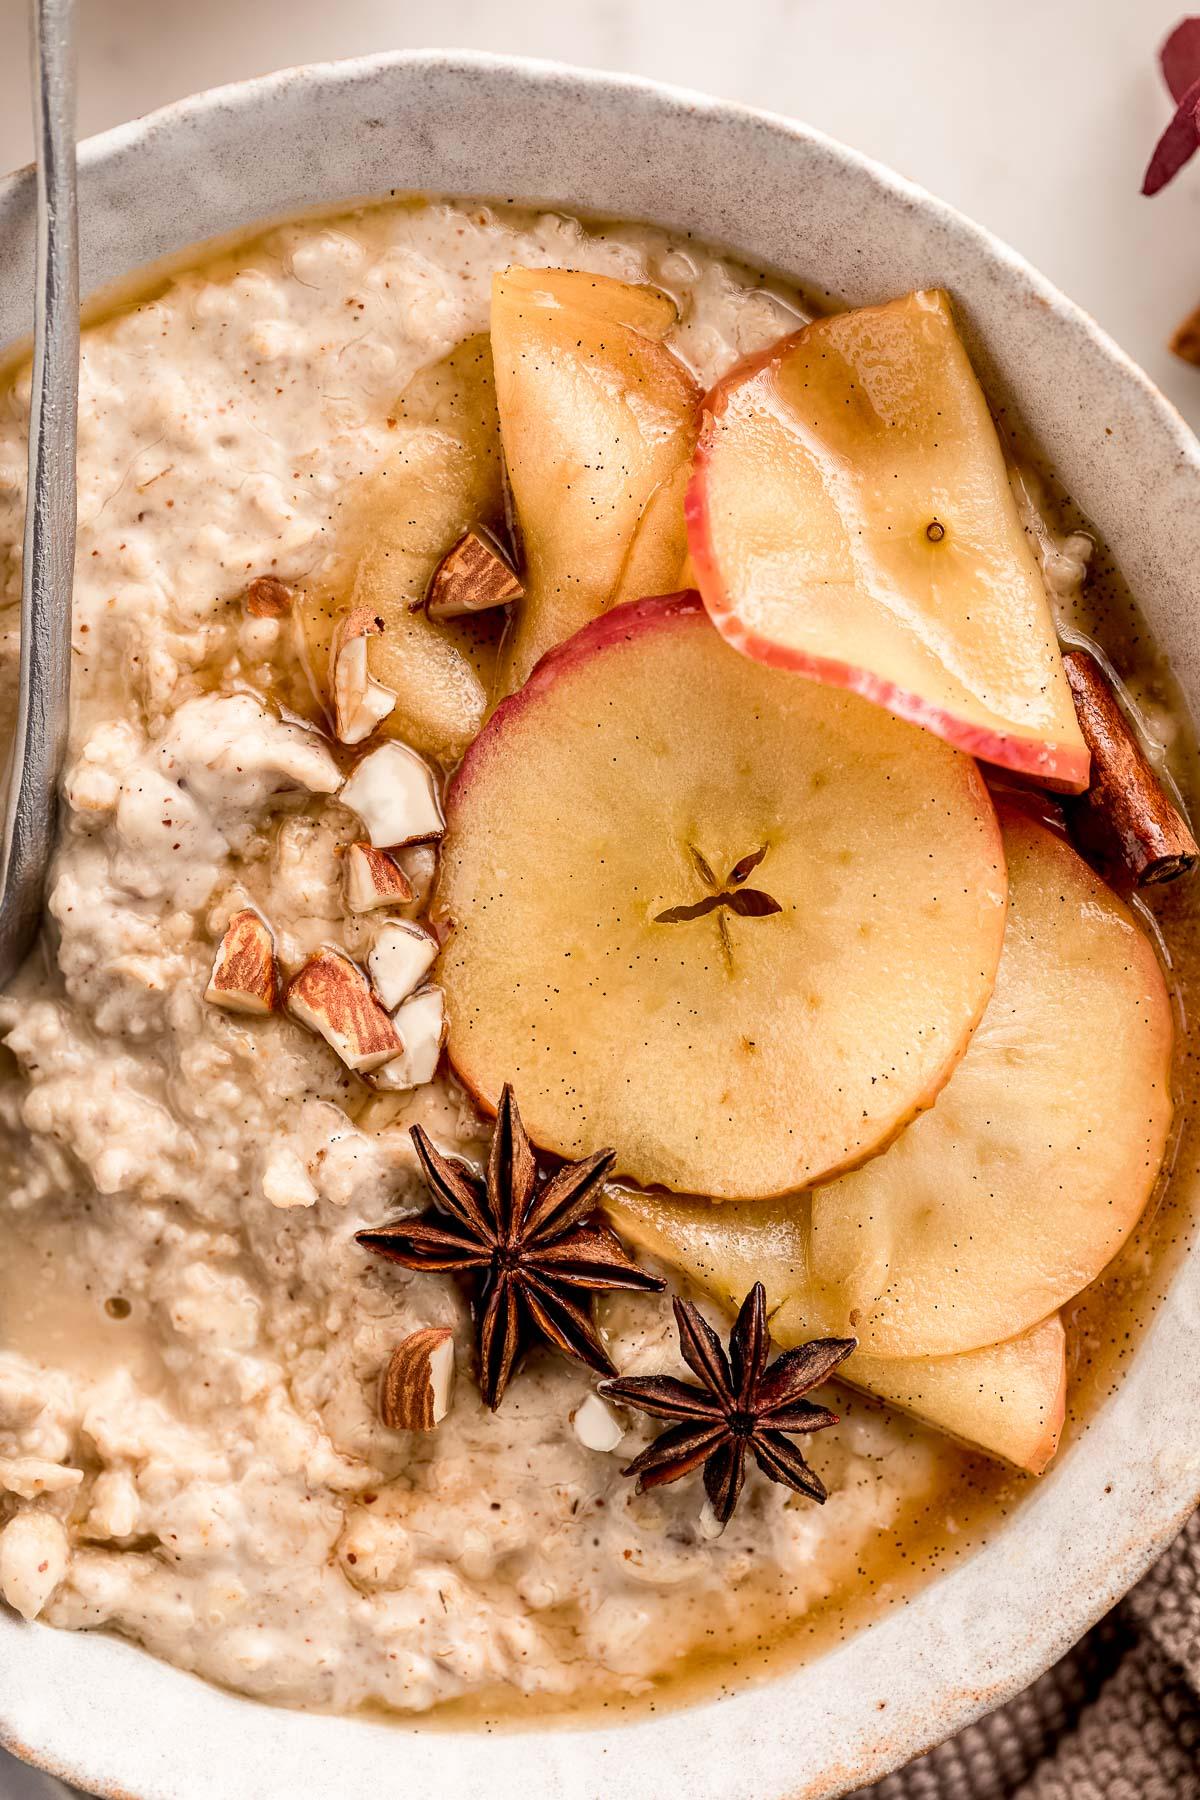 ricetta porridge alle mele e cannella cremoso fiocchi di avena porridge torta di mele vegan healthy creamy apple pie oatmeal recipe gluten-free